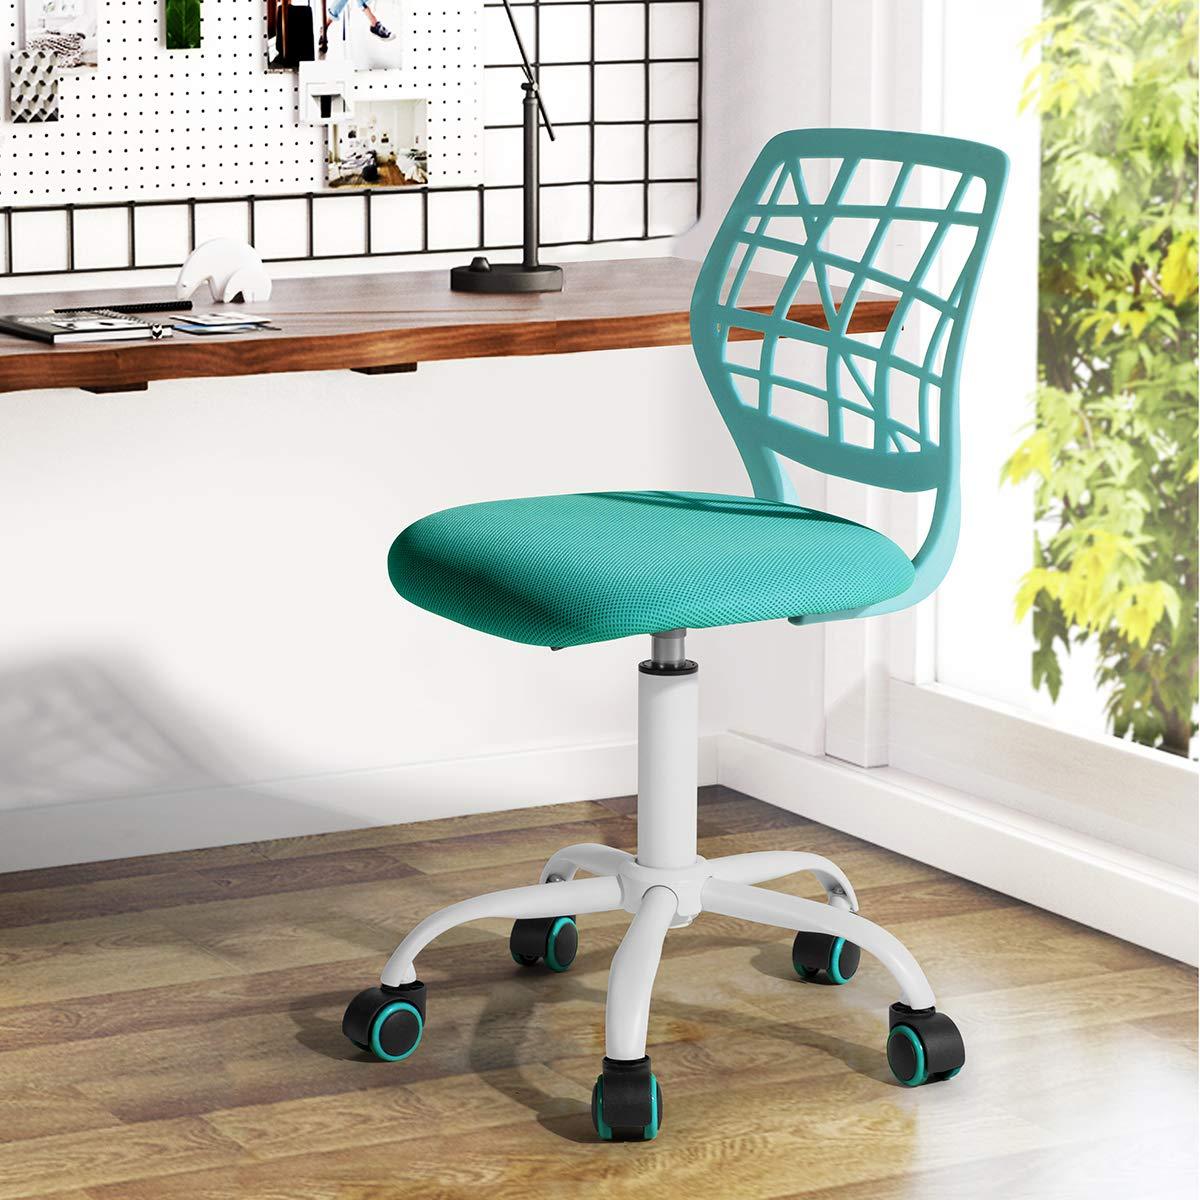 Fanilife Office Chair Adjustable Design Kids Computer Seat Desk Task Chair Swivel Armless Children Study Chair Turquoise Buy Online In Azerbaijan At Azerbaijan Desertcart Com Productid 53178932